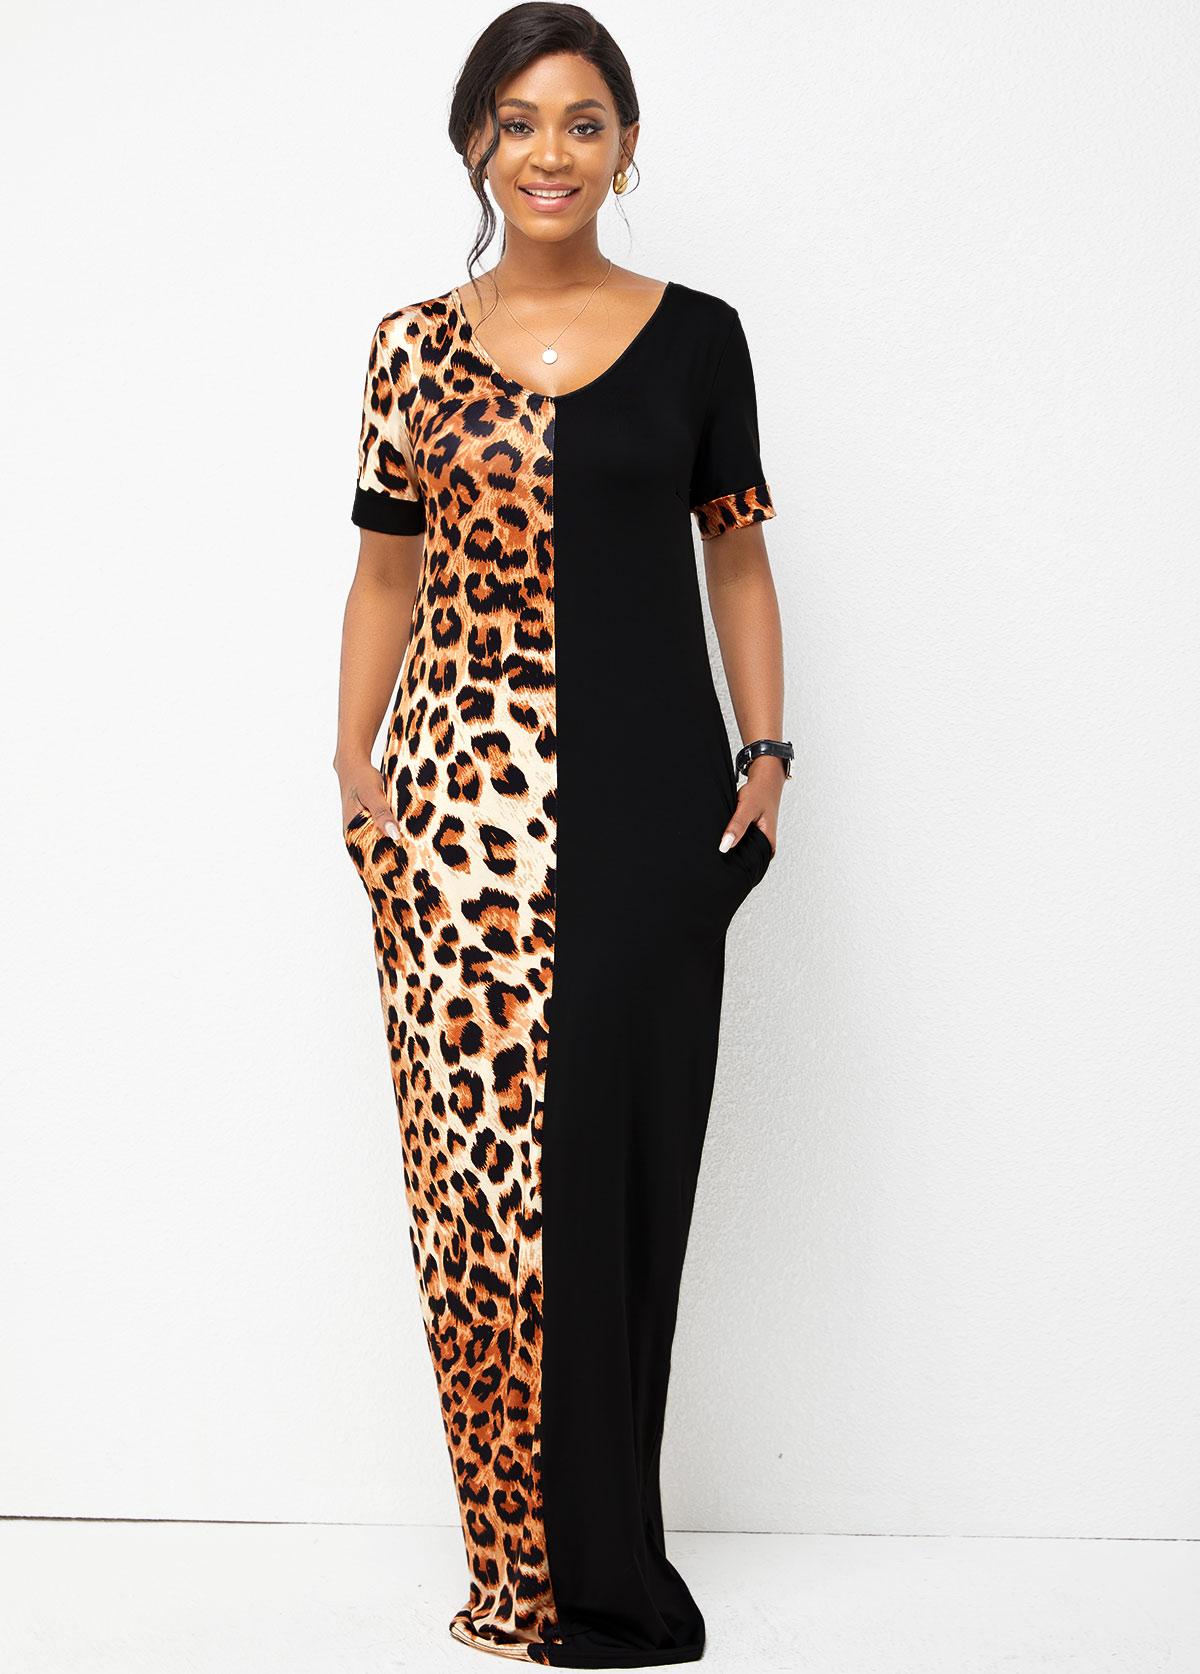 Leopard V Neck Short Sleeve Dress